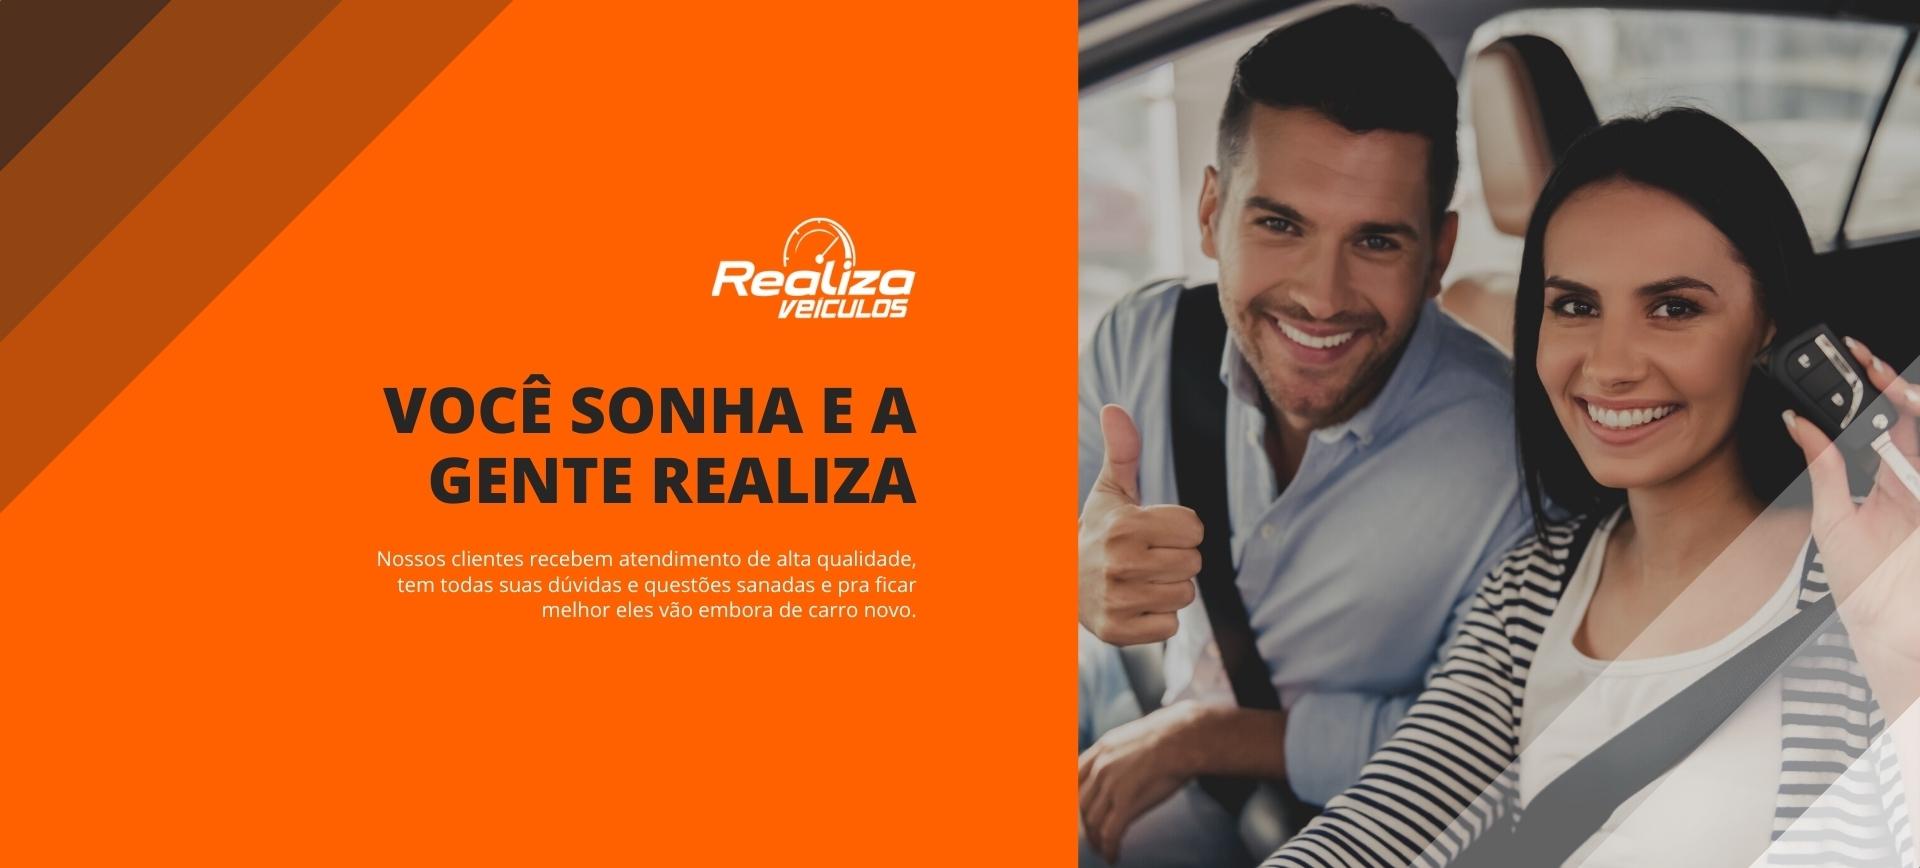 VC SONHA E A GENTE REALIZA